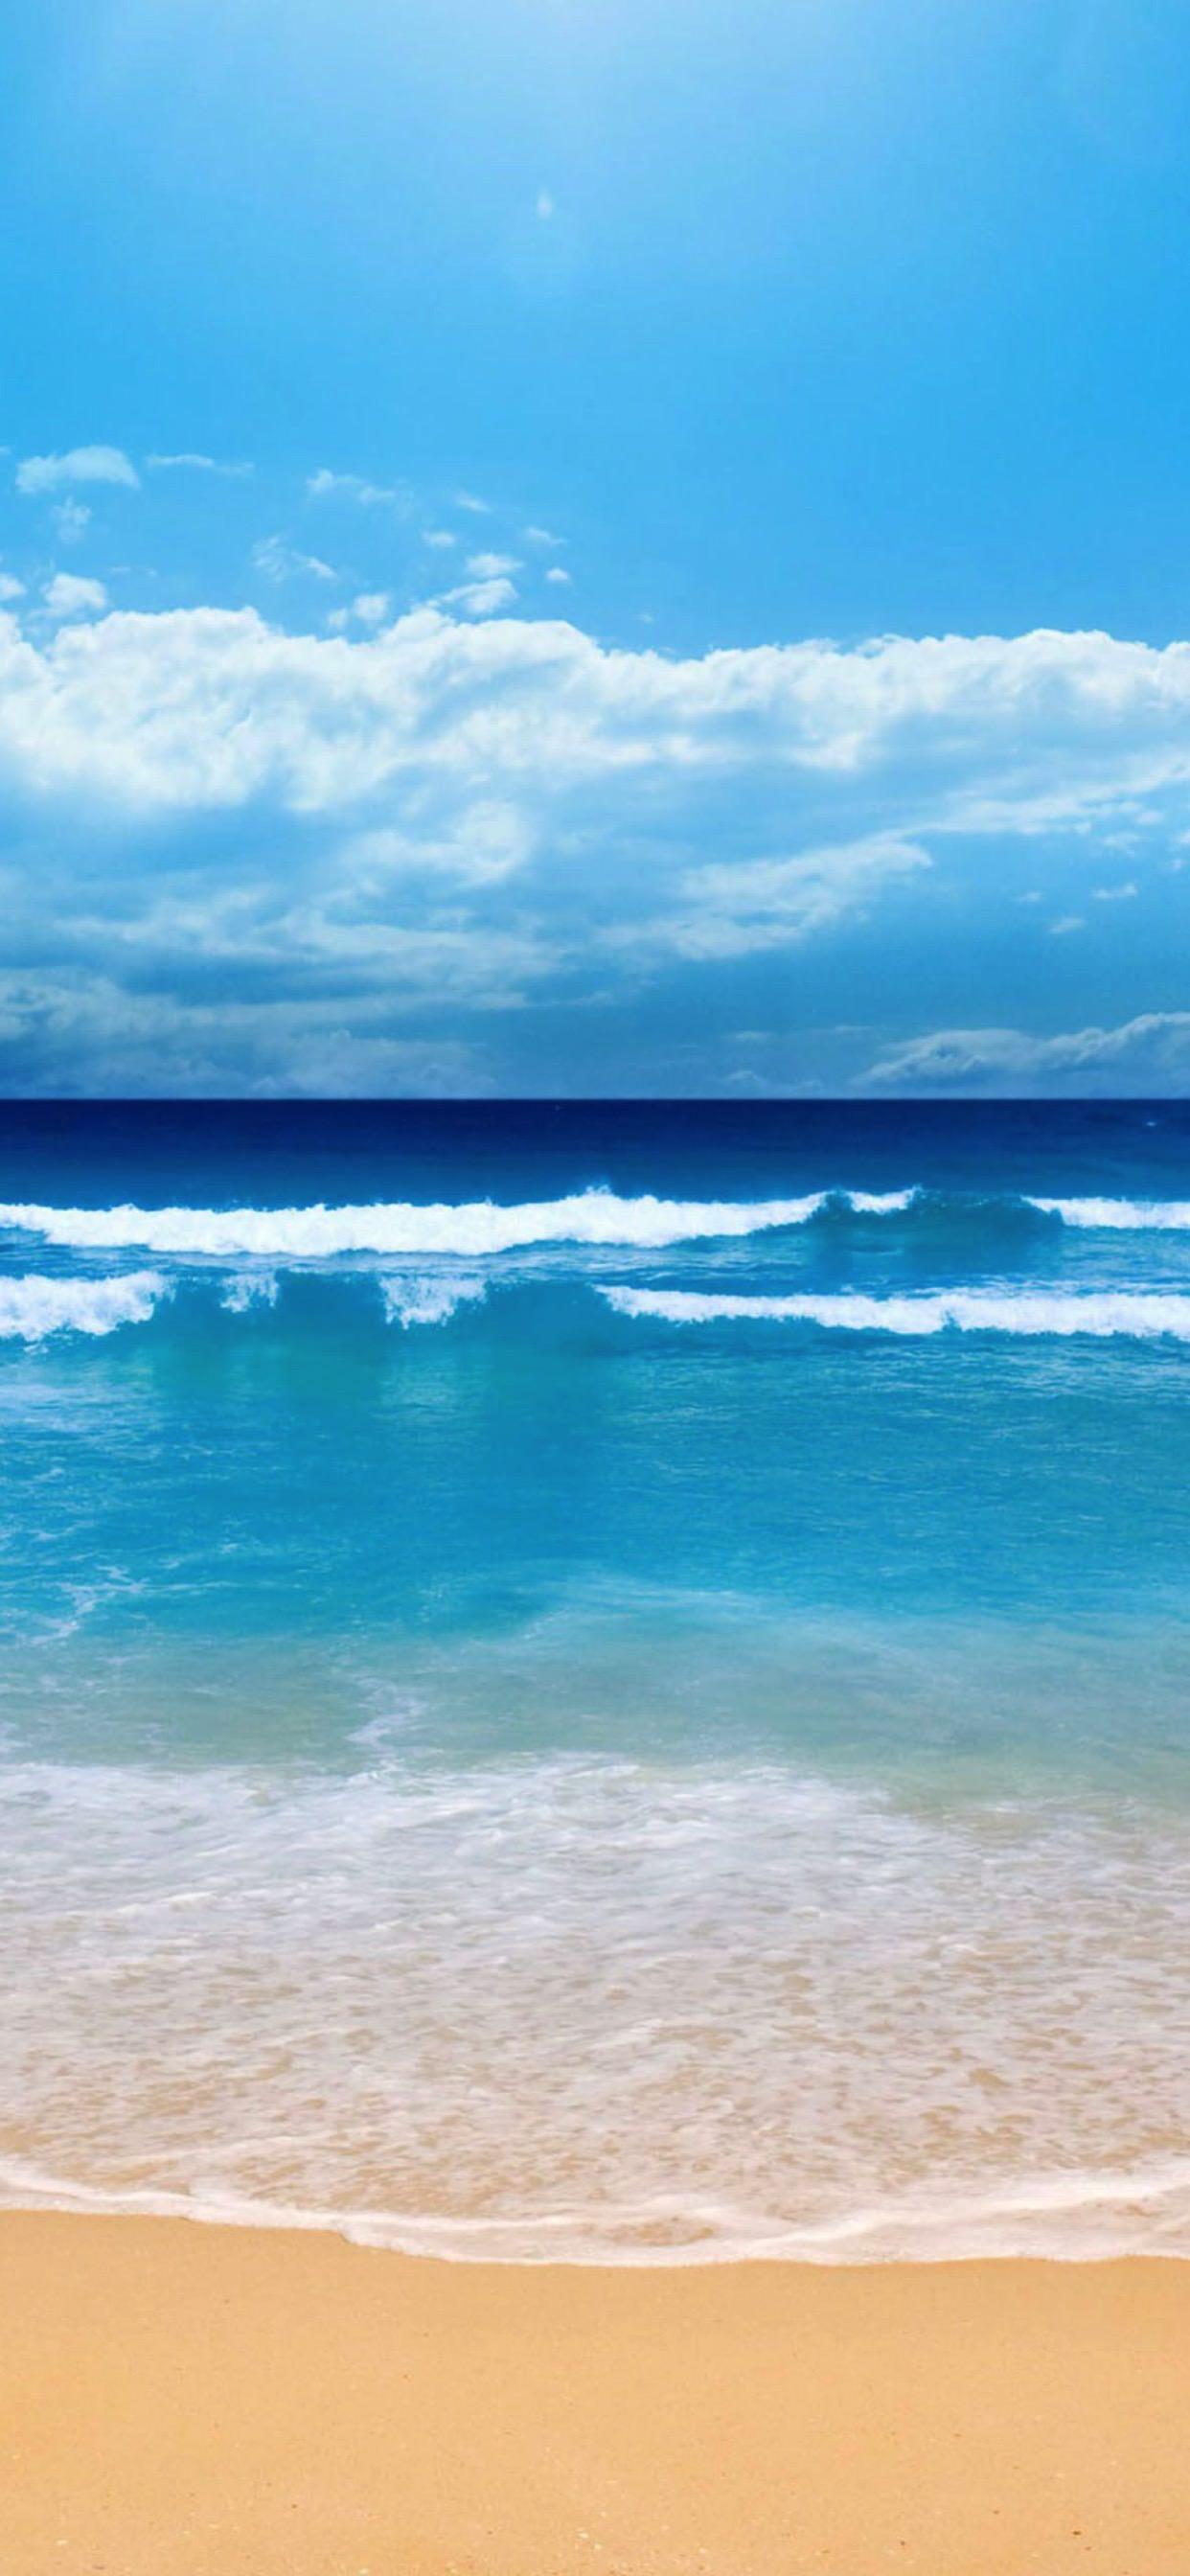 Landscape Sea Blue Sky Wallpaper Sc Iphone Xs Max